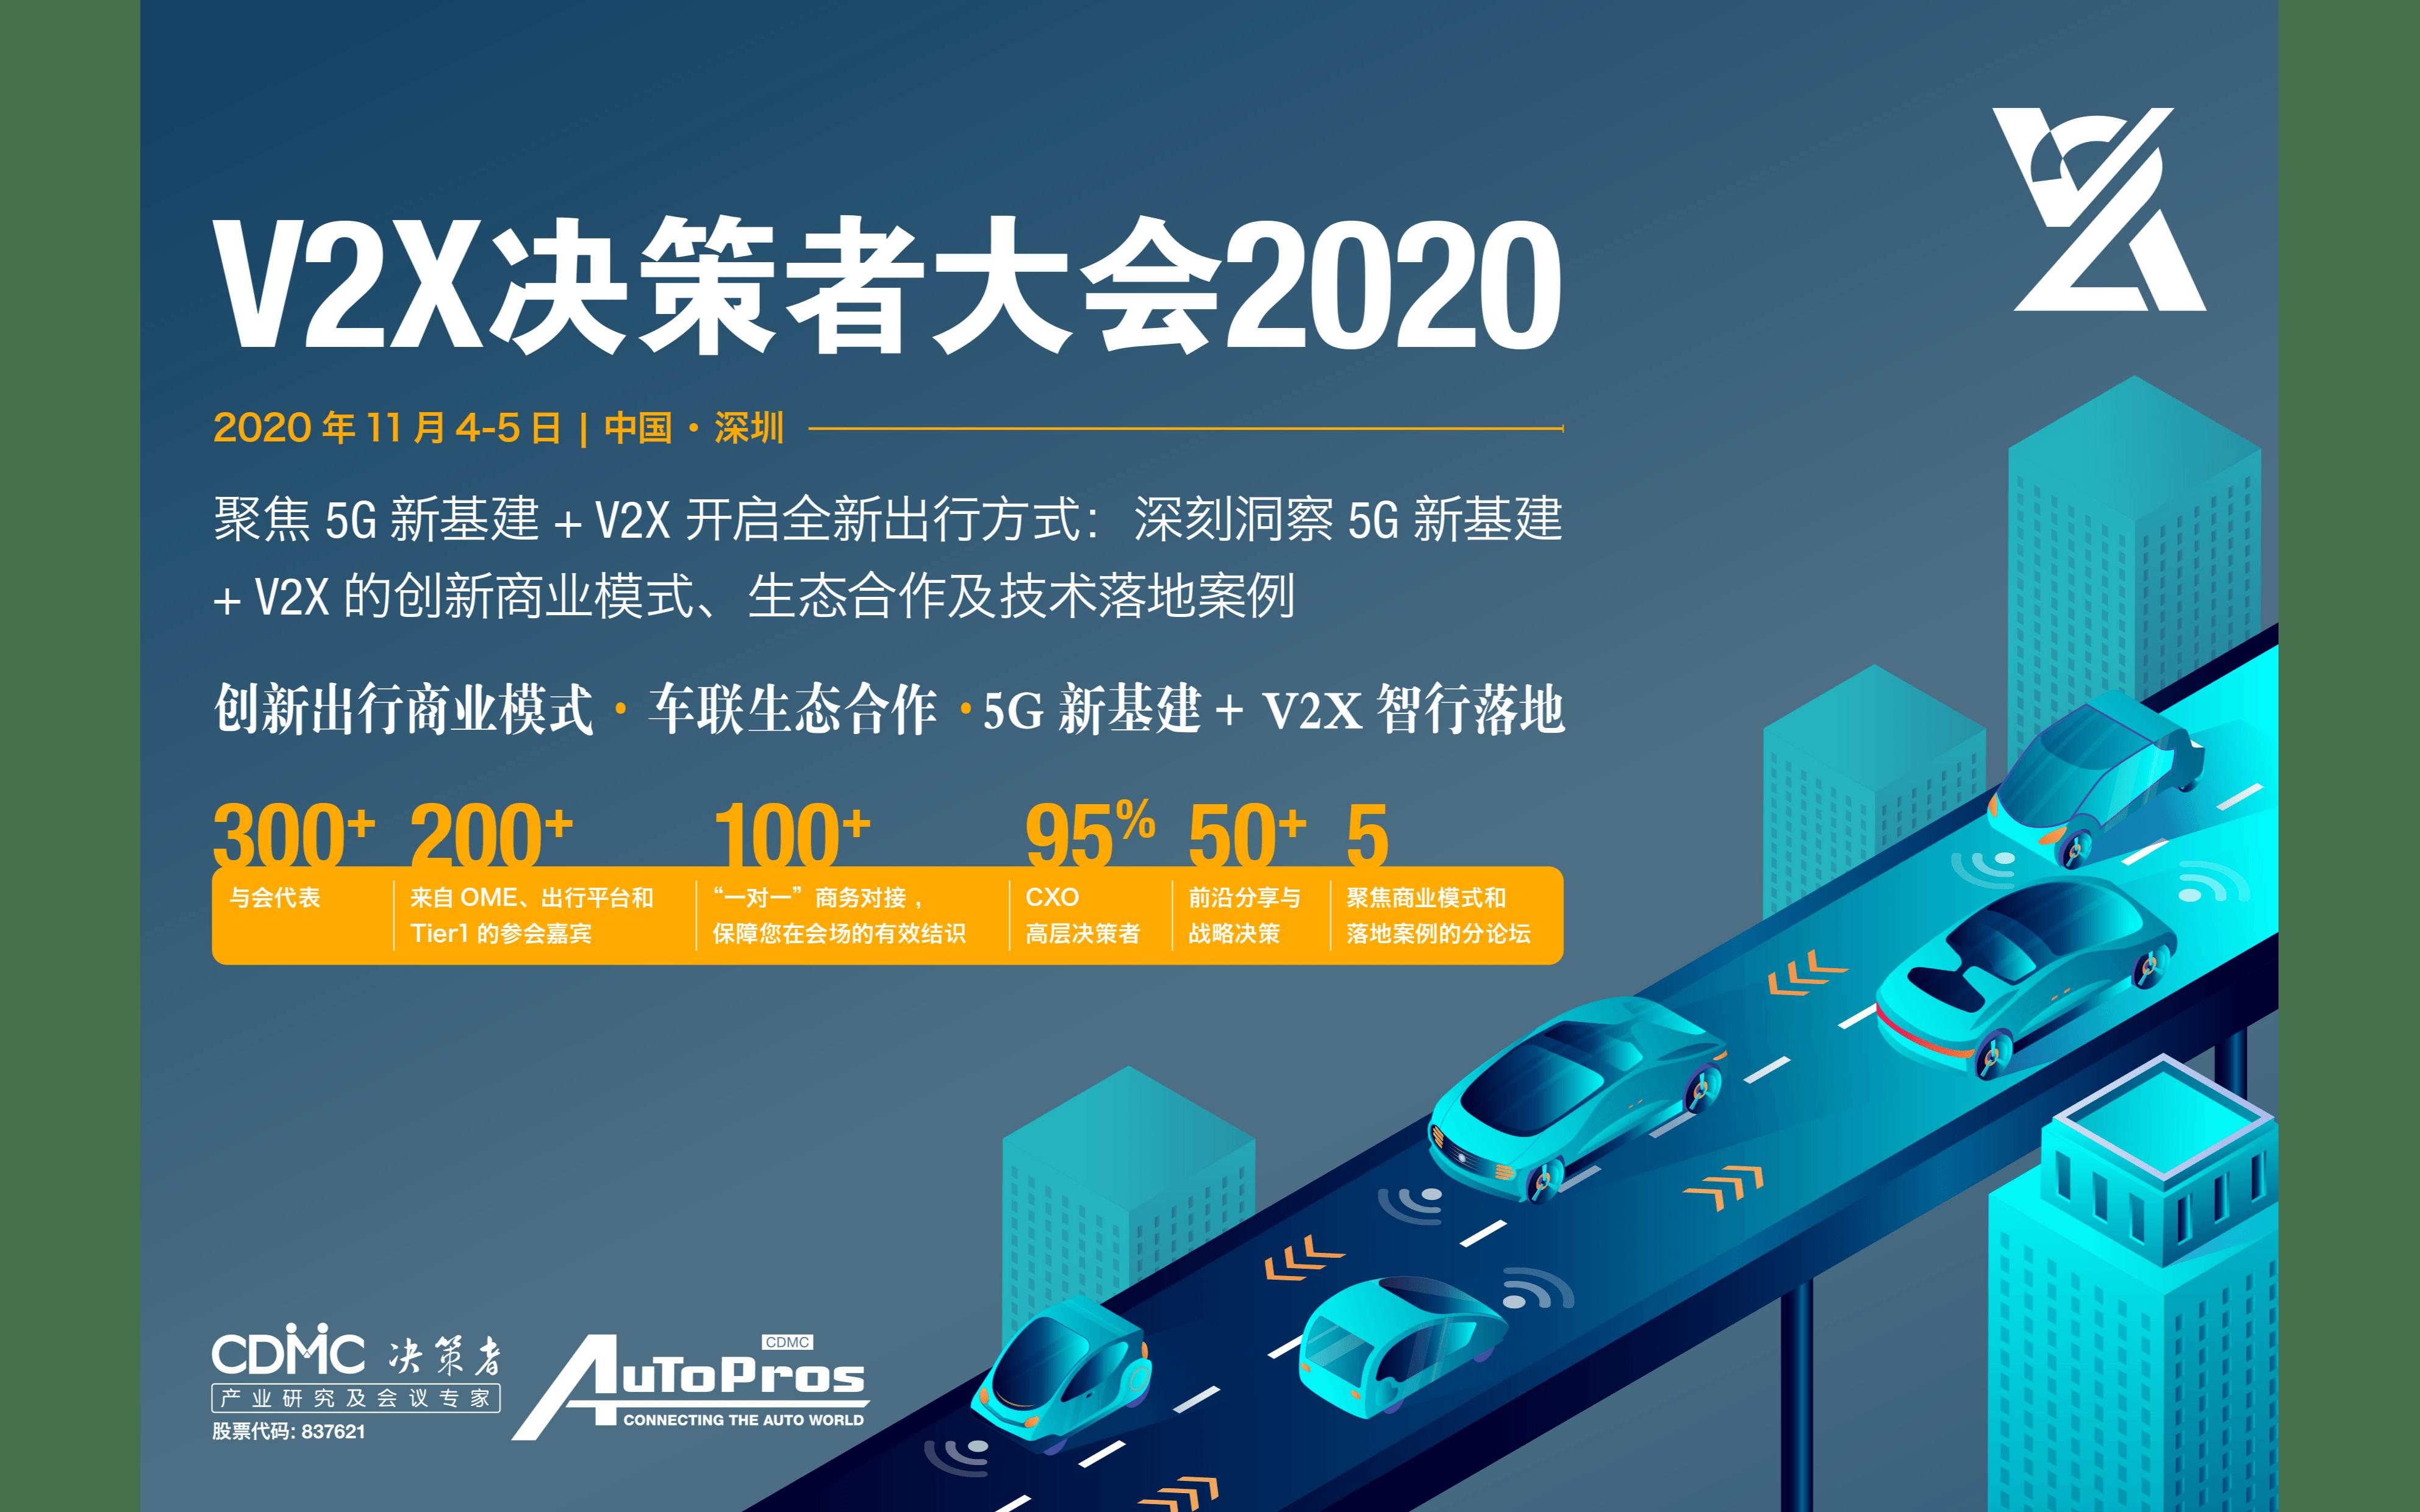 V2X決策者大會2020(上海)